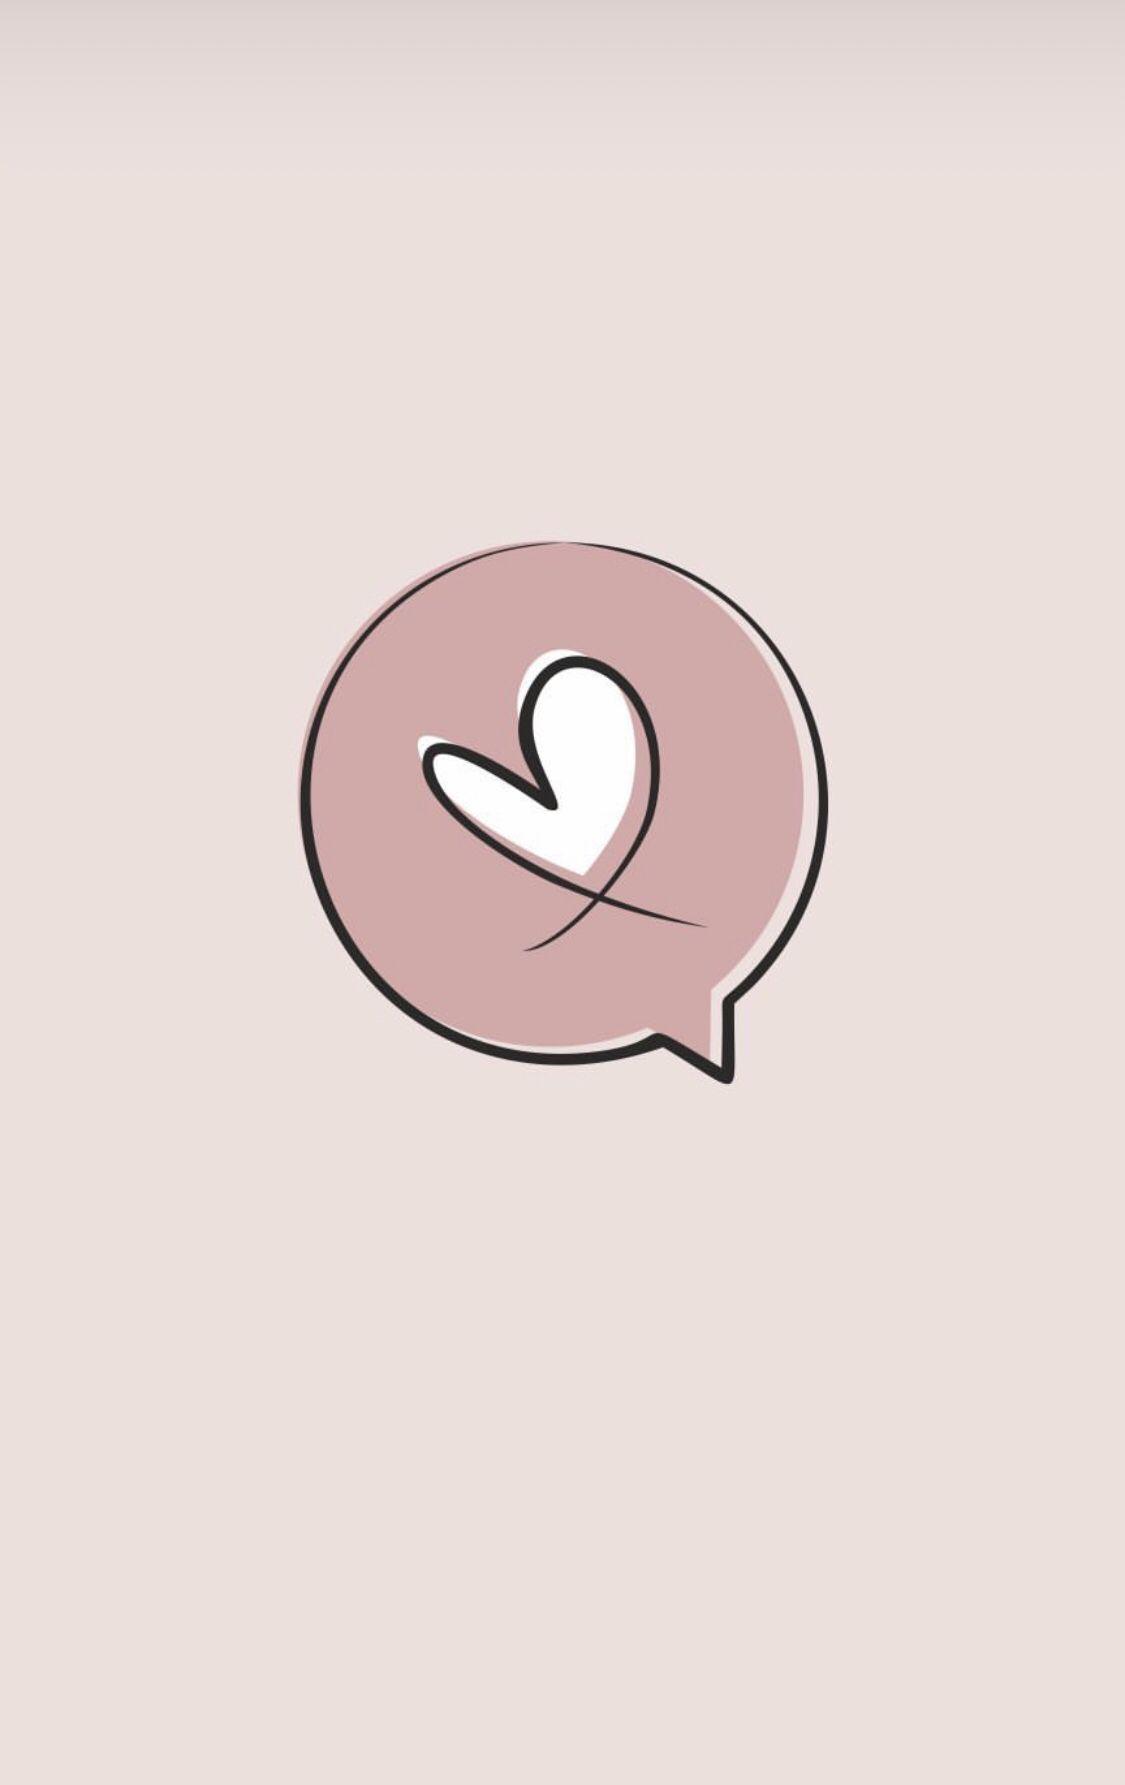 Instagram Logo Instagram Story Sunflower Wallpaper Fashion Design Drawings Insta Story Ig Story Insta Icon Instagram Logo Instagram Icons Instagram Theme